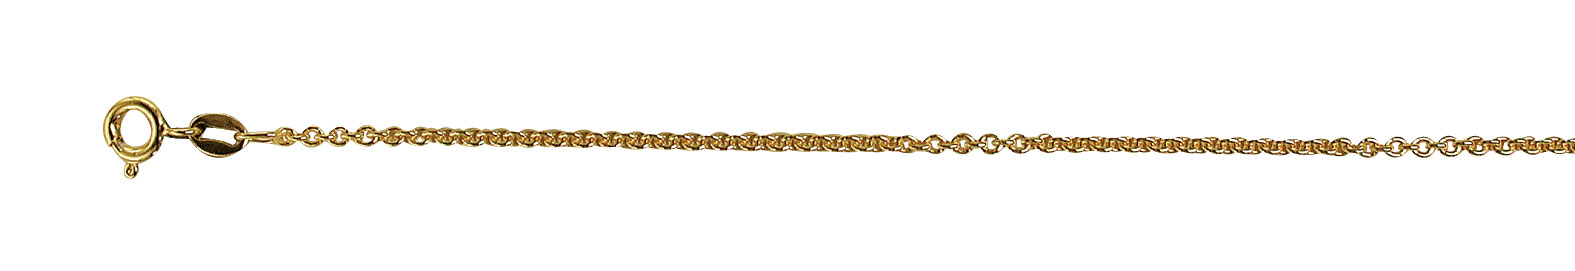 Aagaard Sølv kæde - 0342050-38